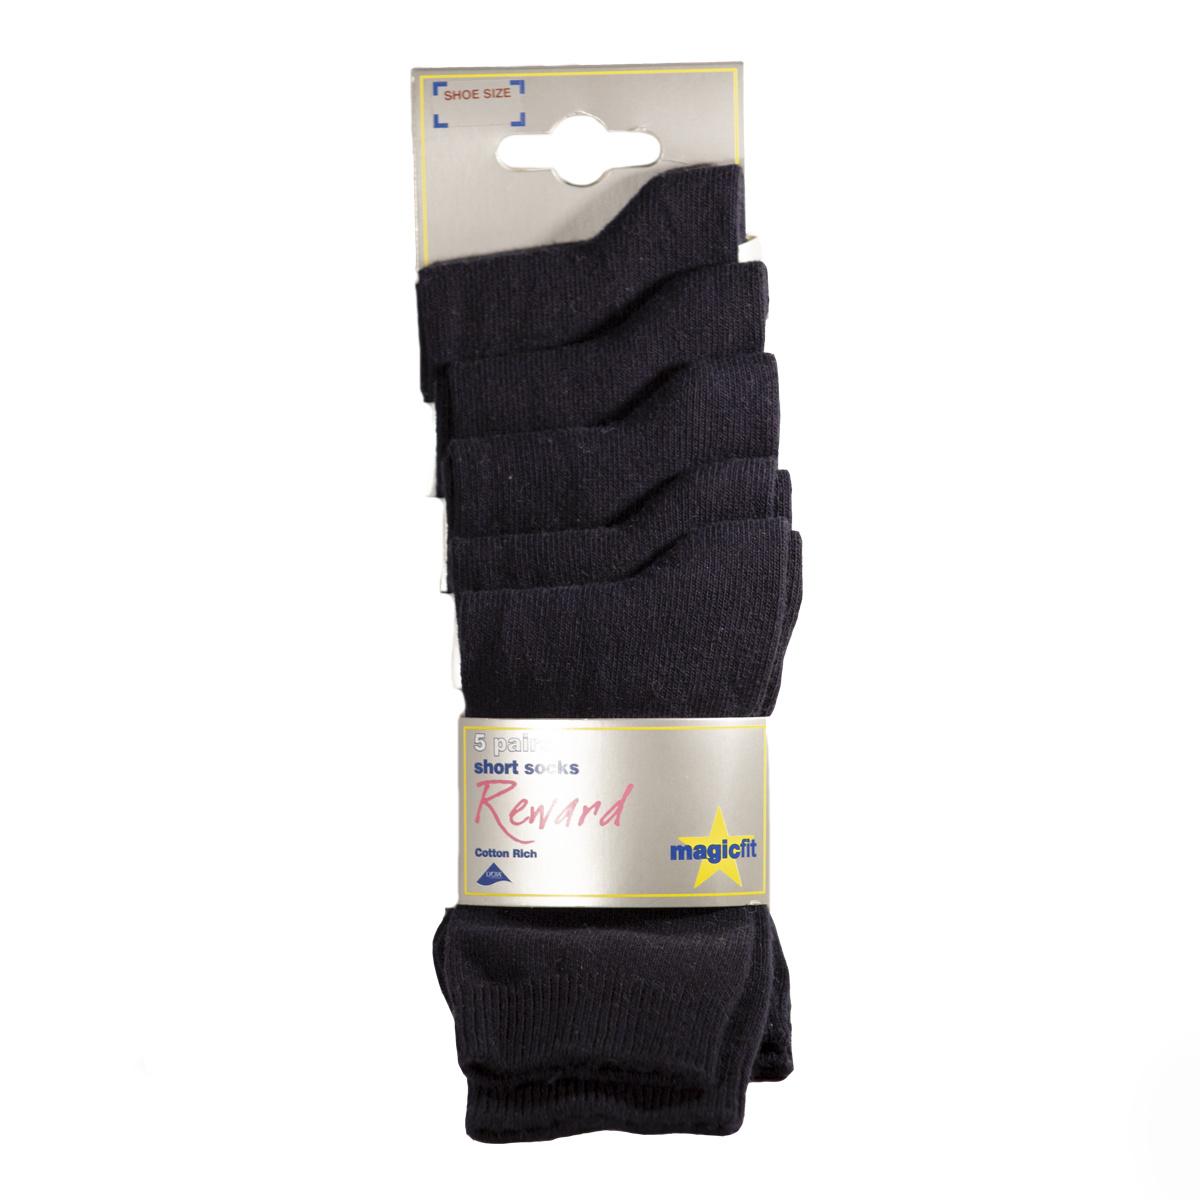 Reward Short Socks